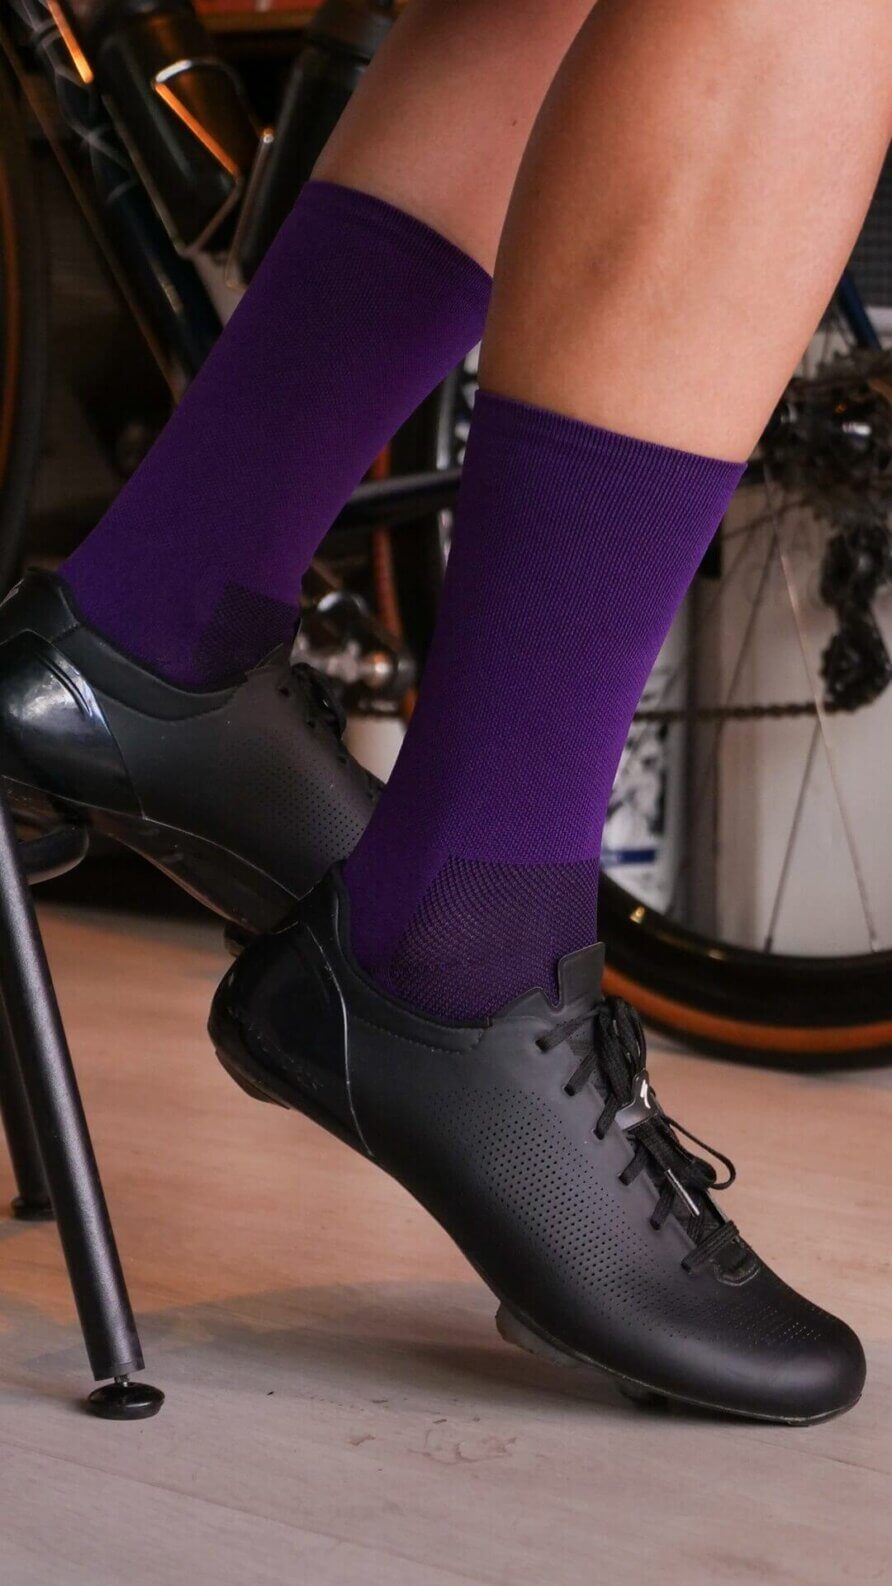 purple nologo cycling socks